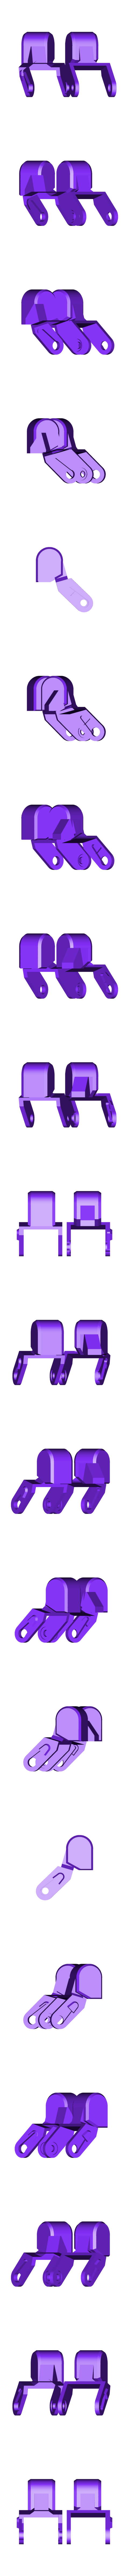 m-legs.stl Download free STL file Ez Arduino MiniKame Mk2 - 8 DOF Quadruped Robot • 3D printing object, manic-3d-print